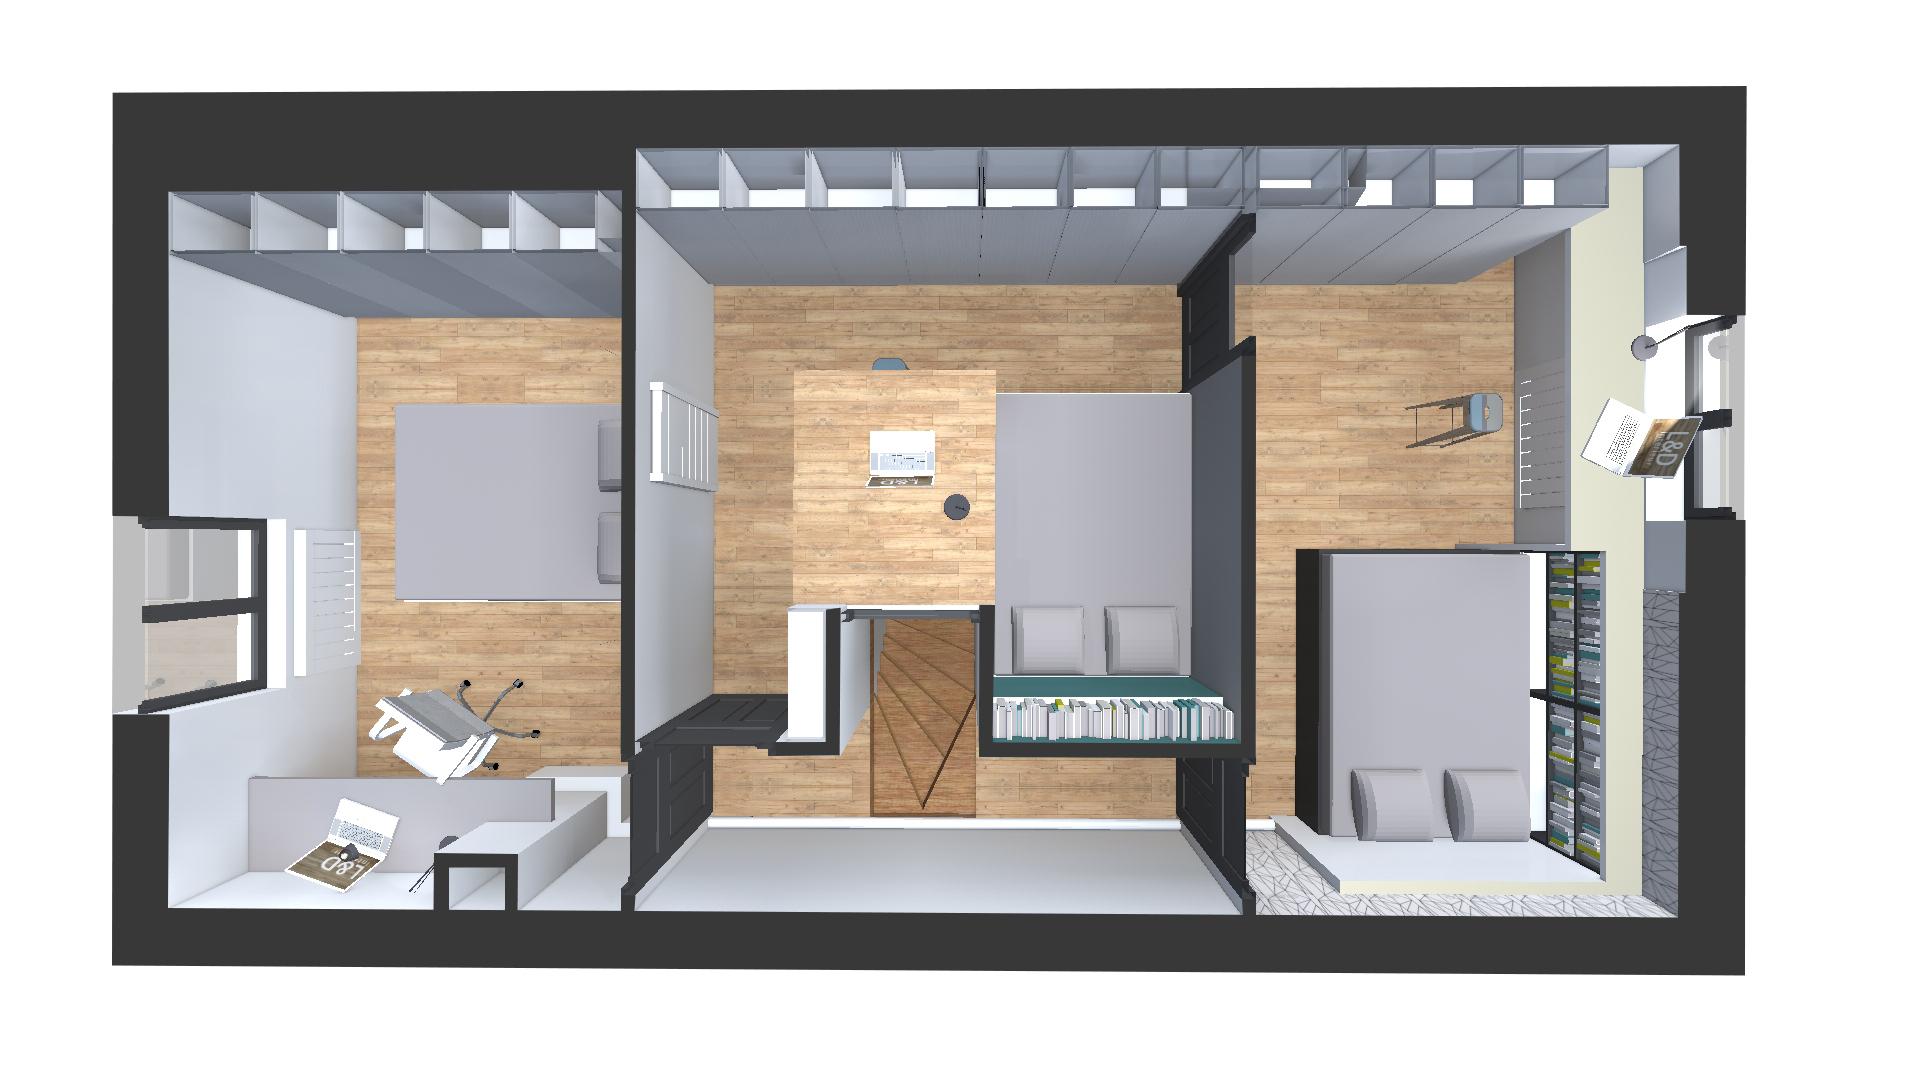 optimisation d espace enfant l d int rieur. Black Bedroom Furniture Sets. Home Design Ideas